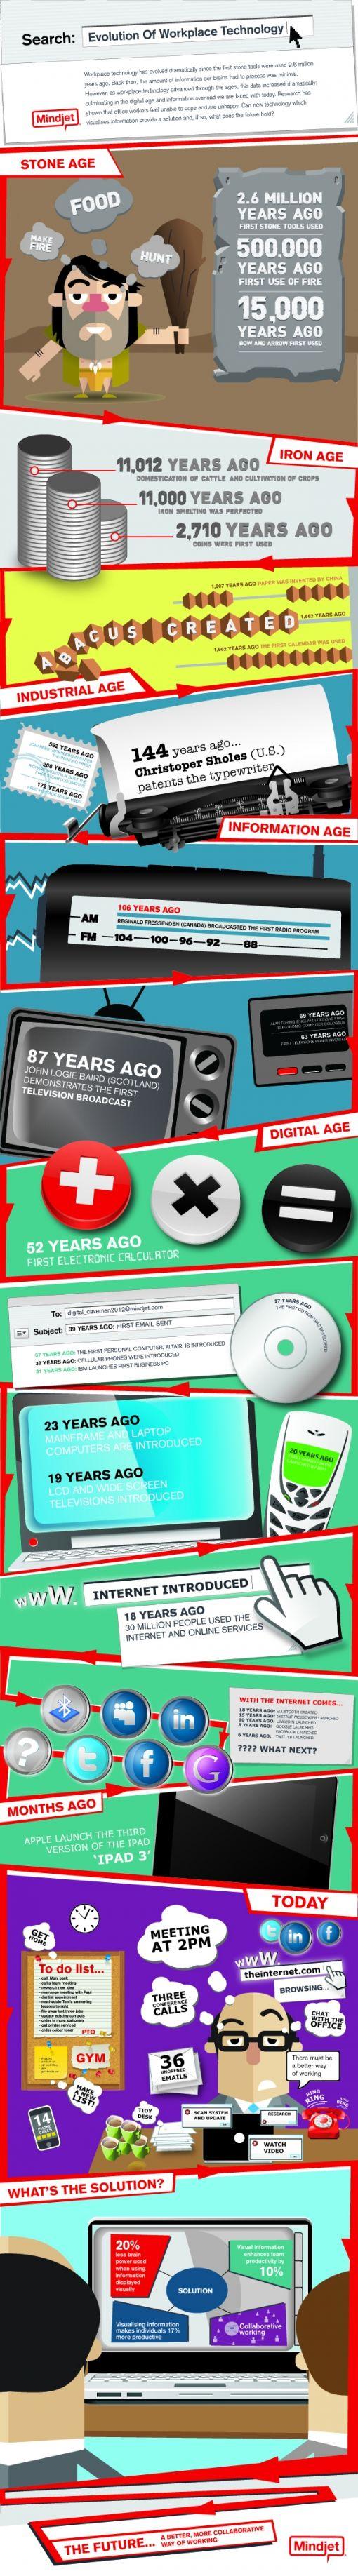 Mindjet_Digital Cavemen_Infographic